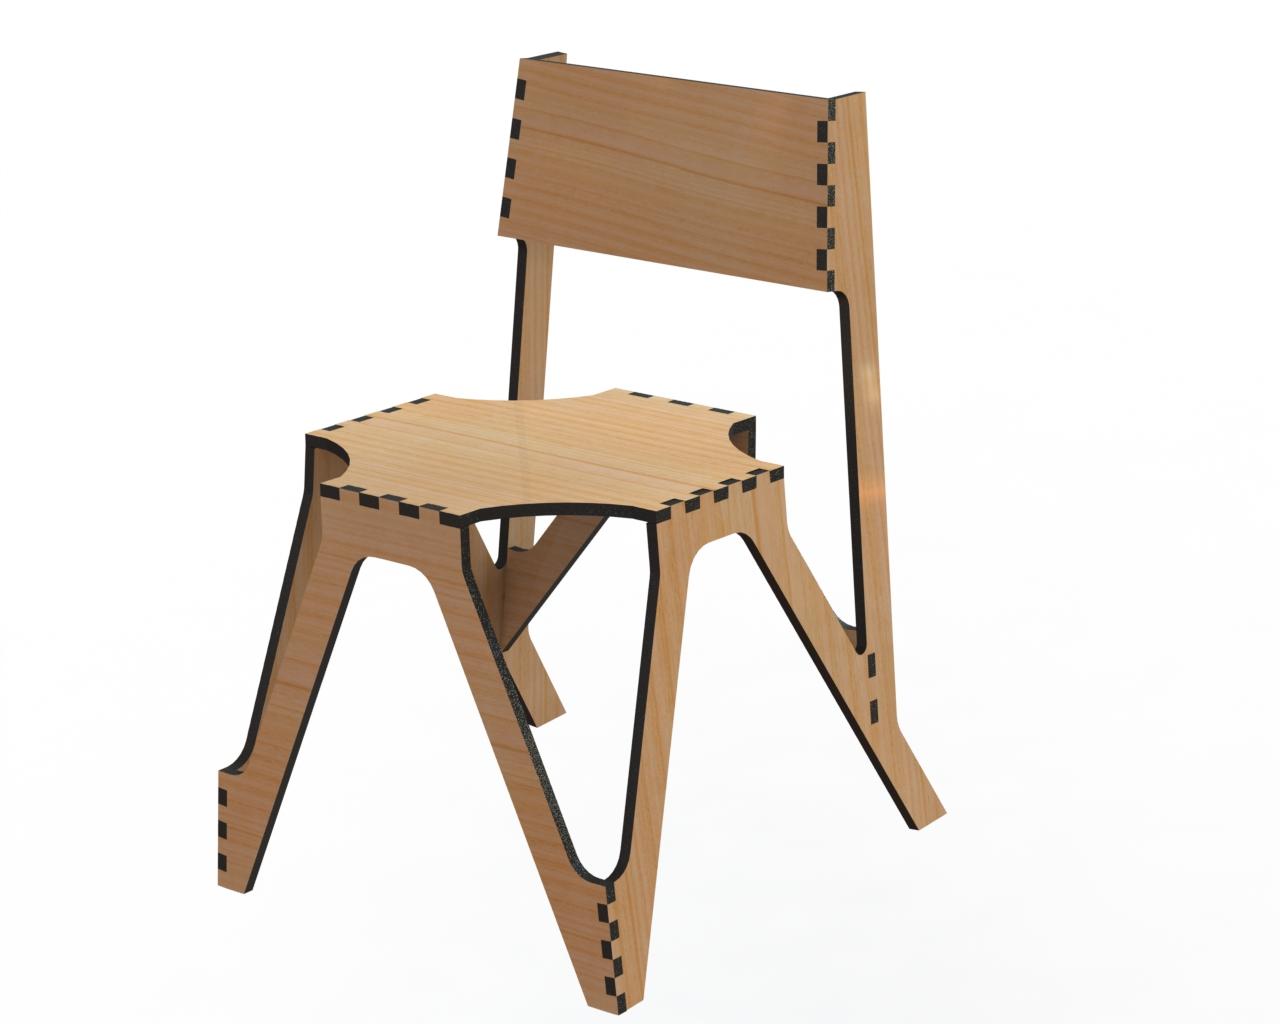 Laser Cut Decor Chair Free Vector